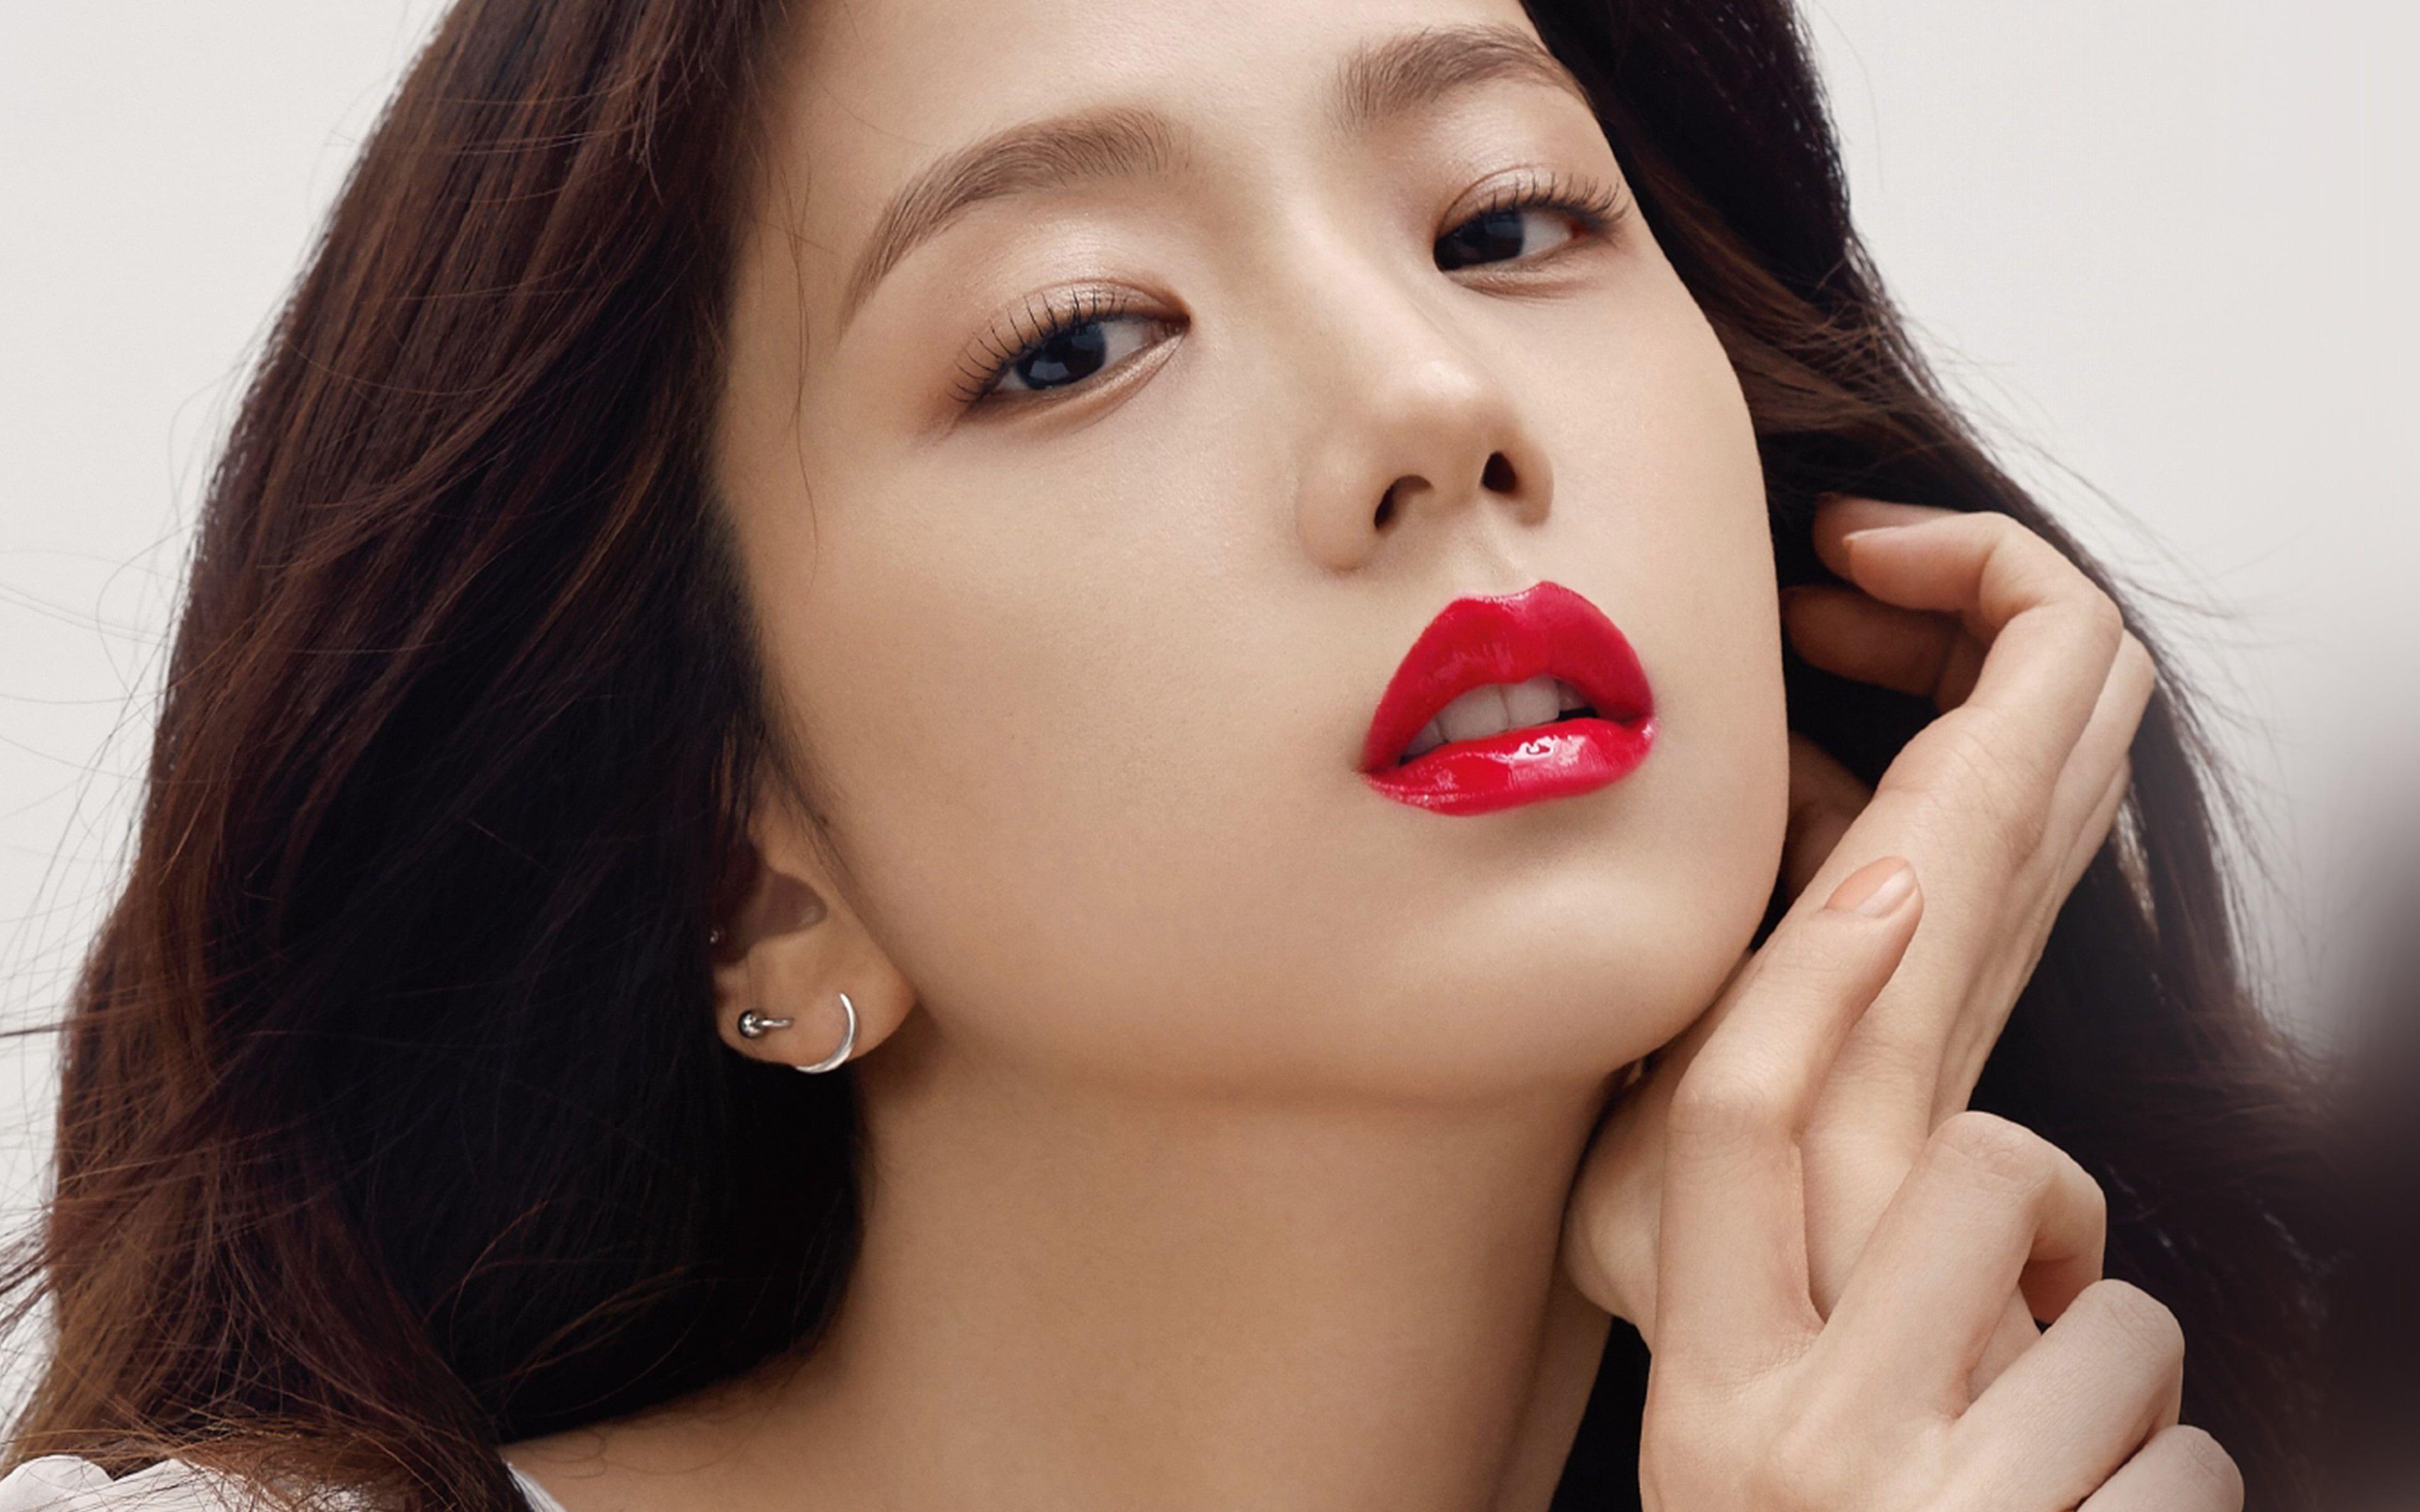 Kpop Blackpink Girl Red Lips 4k Wallpaper Hdwallpaper Desktop In 2020 Desktop Wallpaper Blackpink Beauty Lipstick